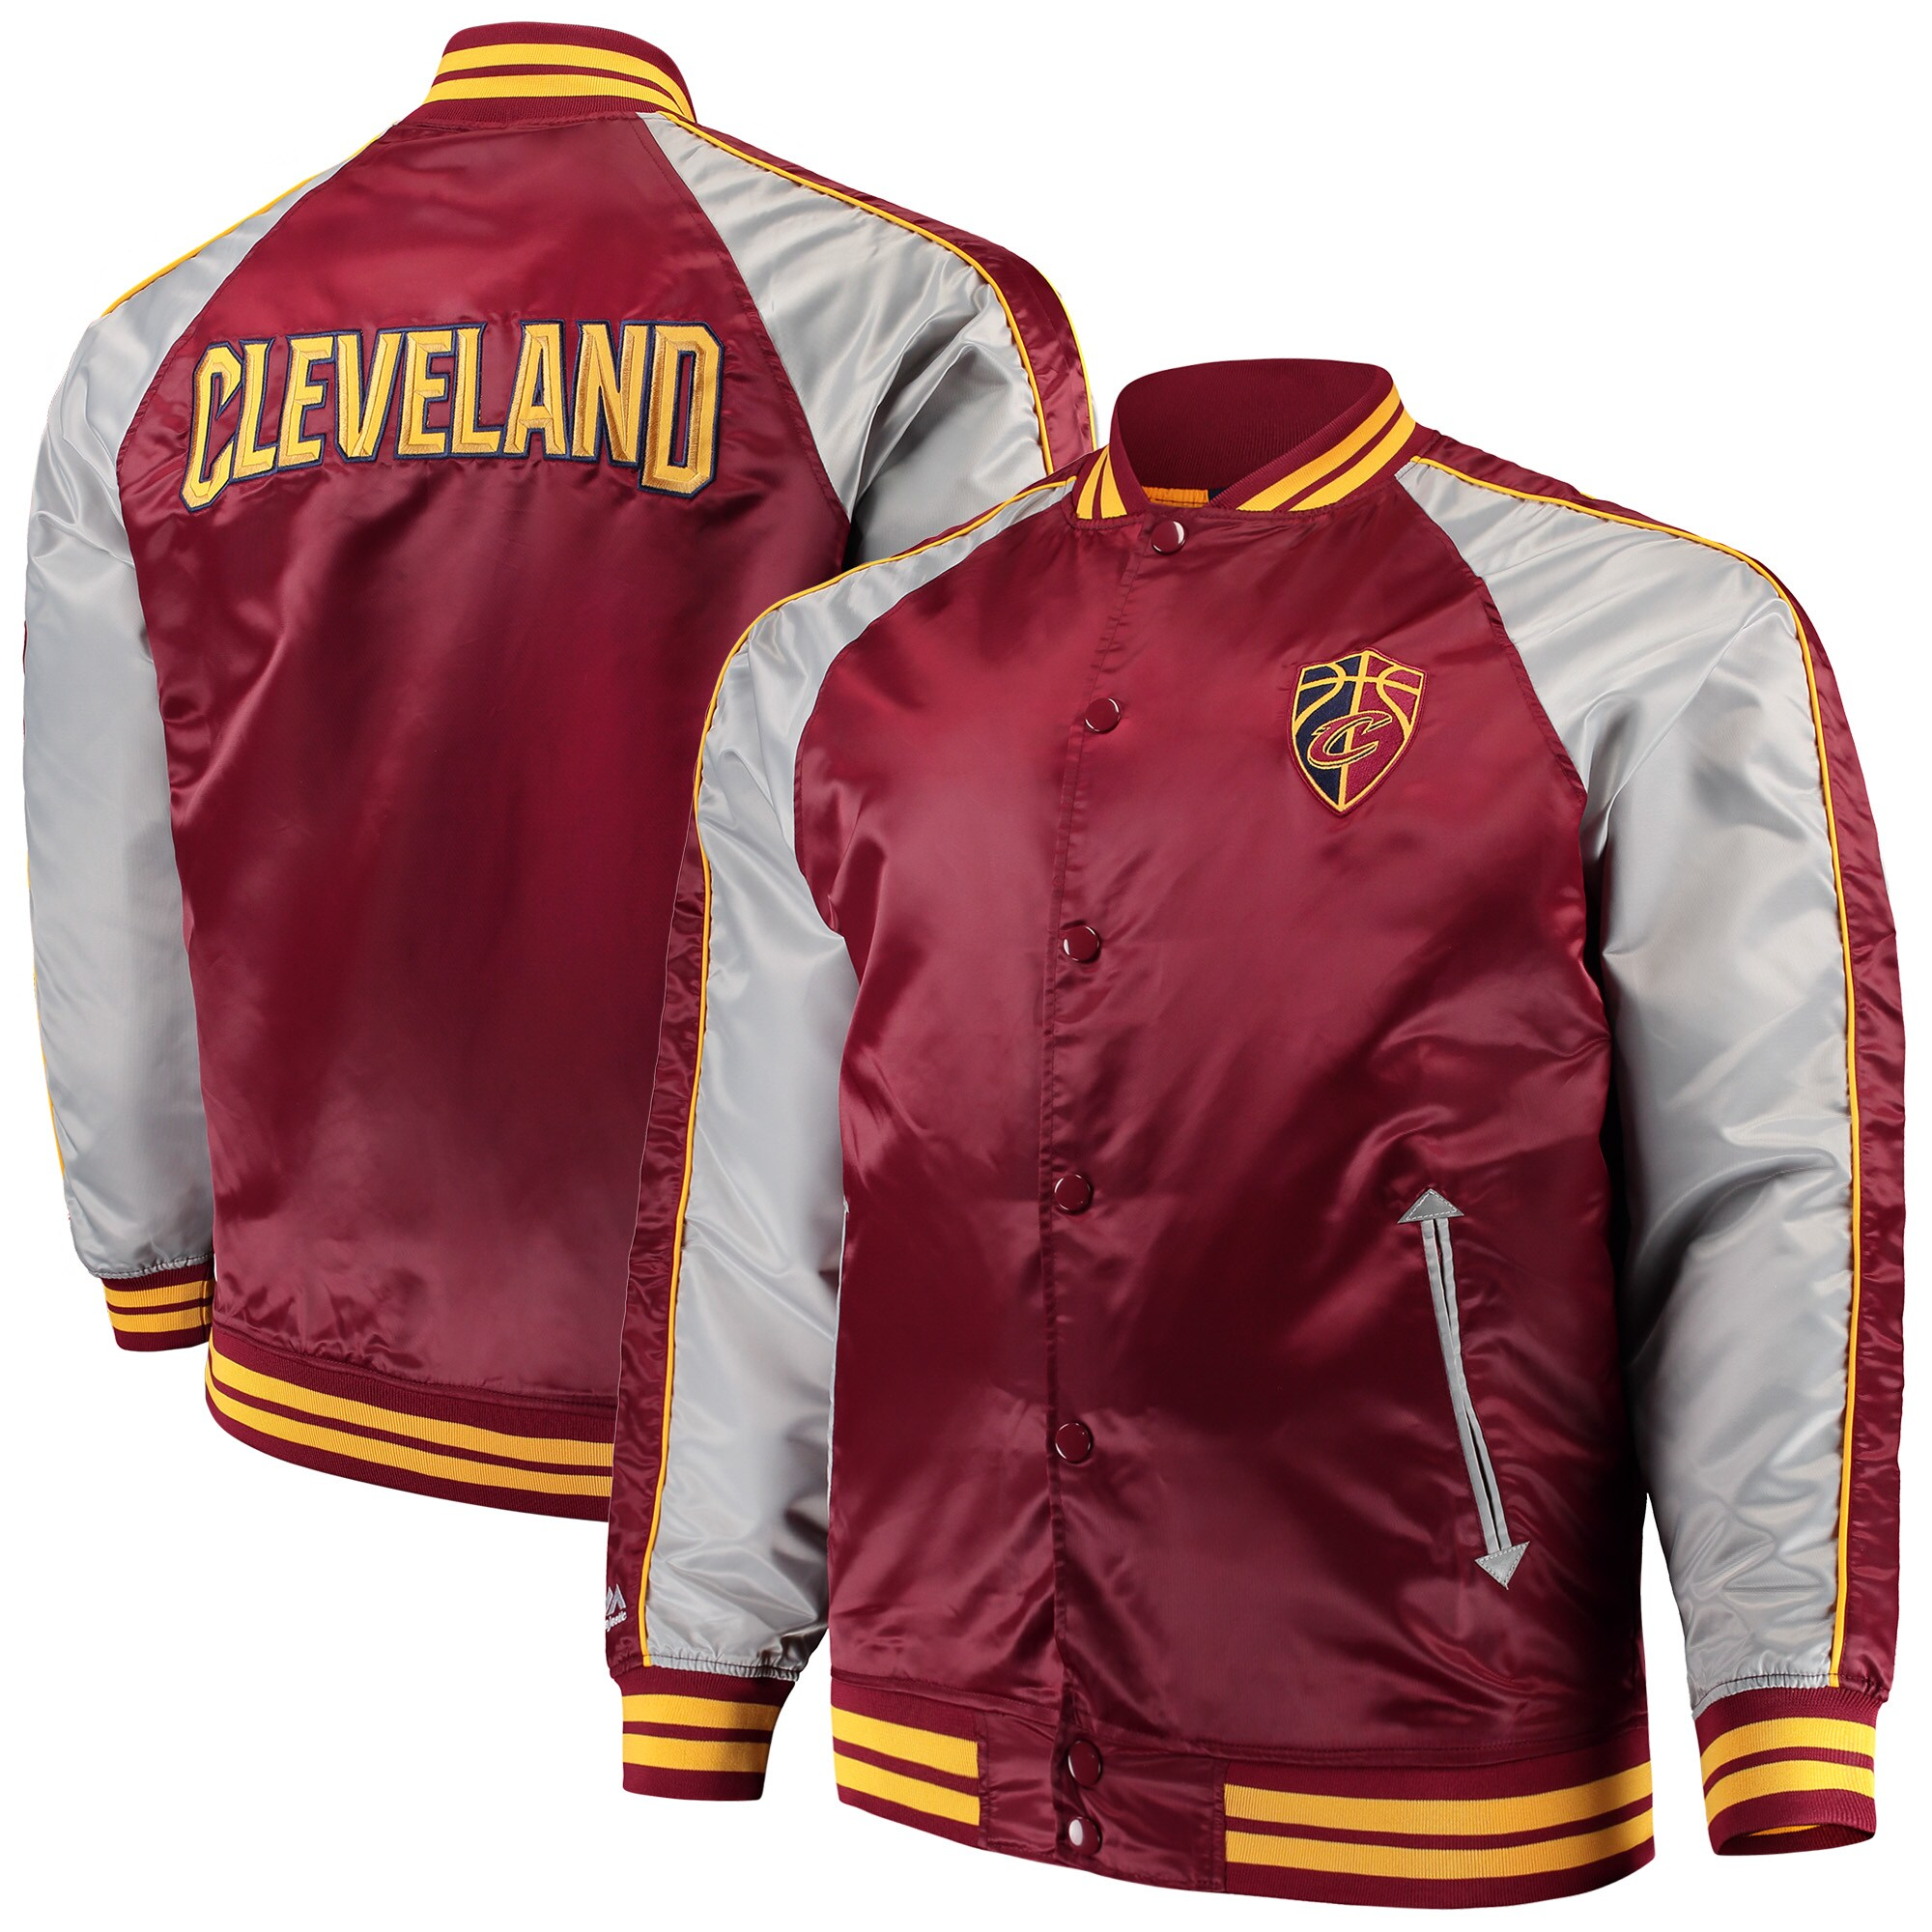 Cleveland Cavaliers Majestic Big & Tall Lightweight Satin Full-Snap Jacket - Wine